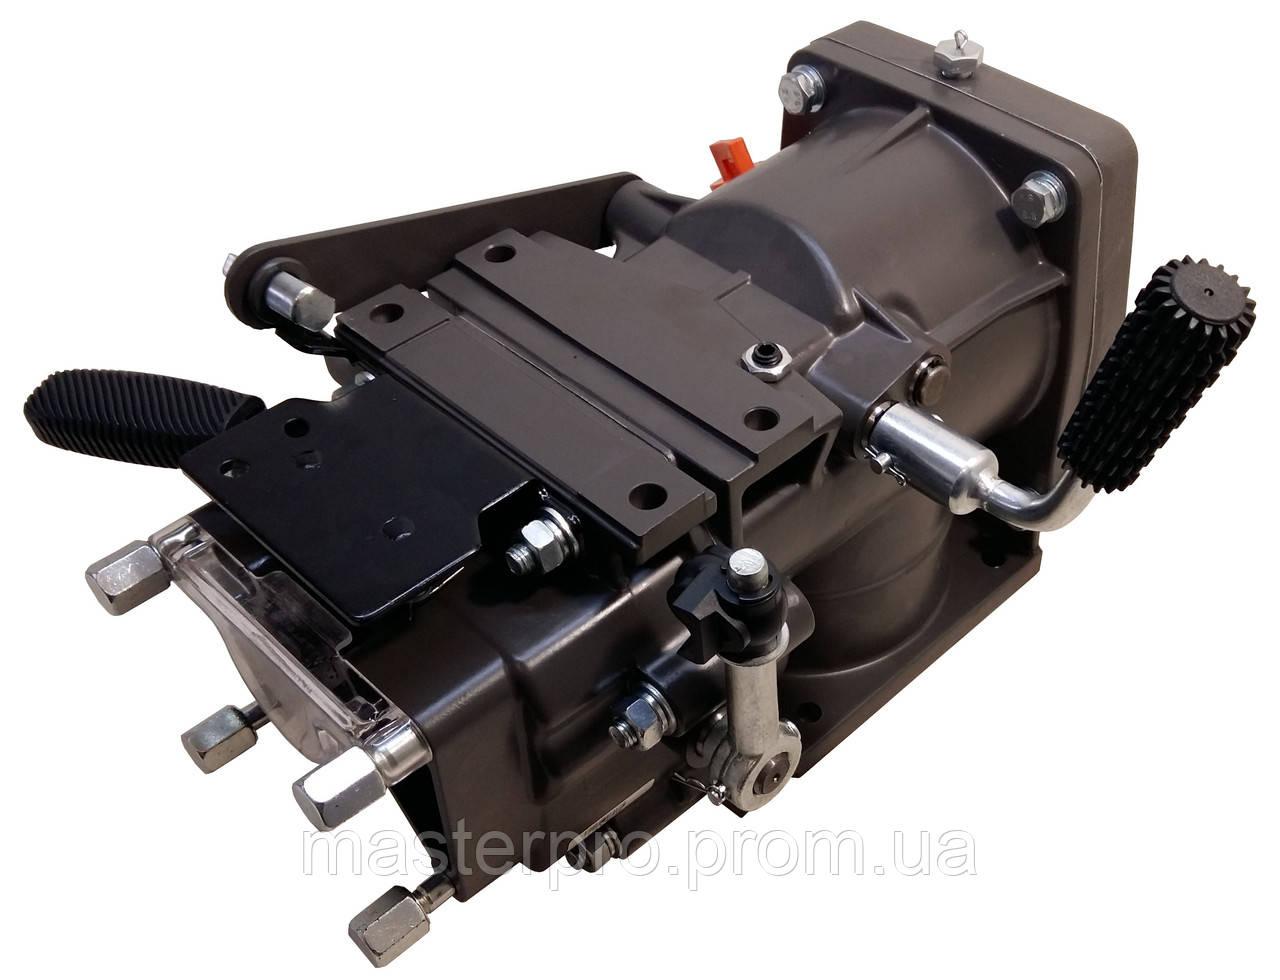 Коробка передач Weima 6-швидкостей (Ходоуменьшитель)